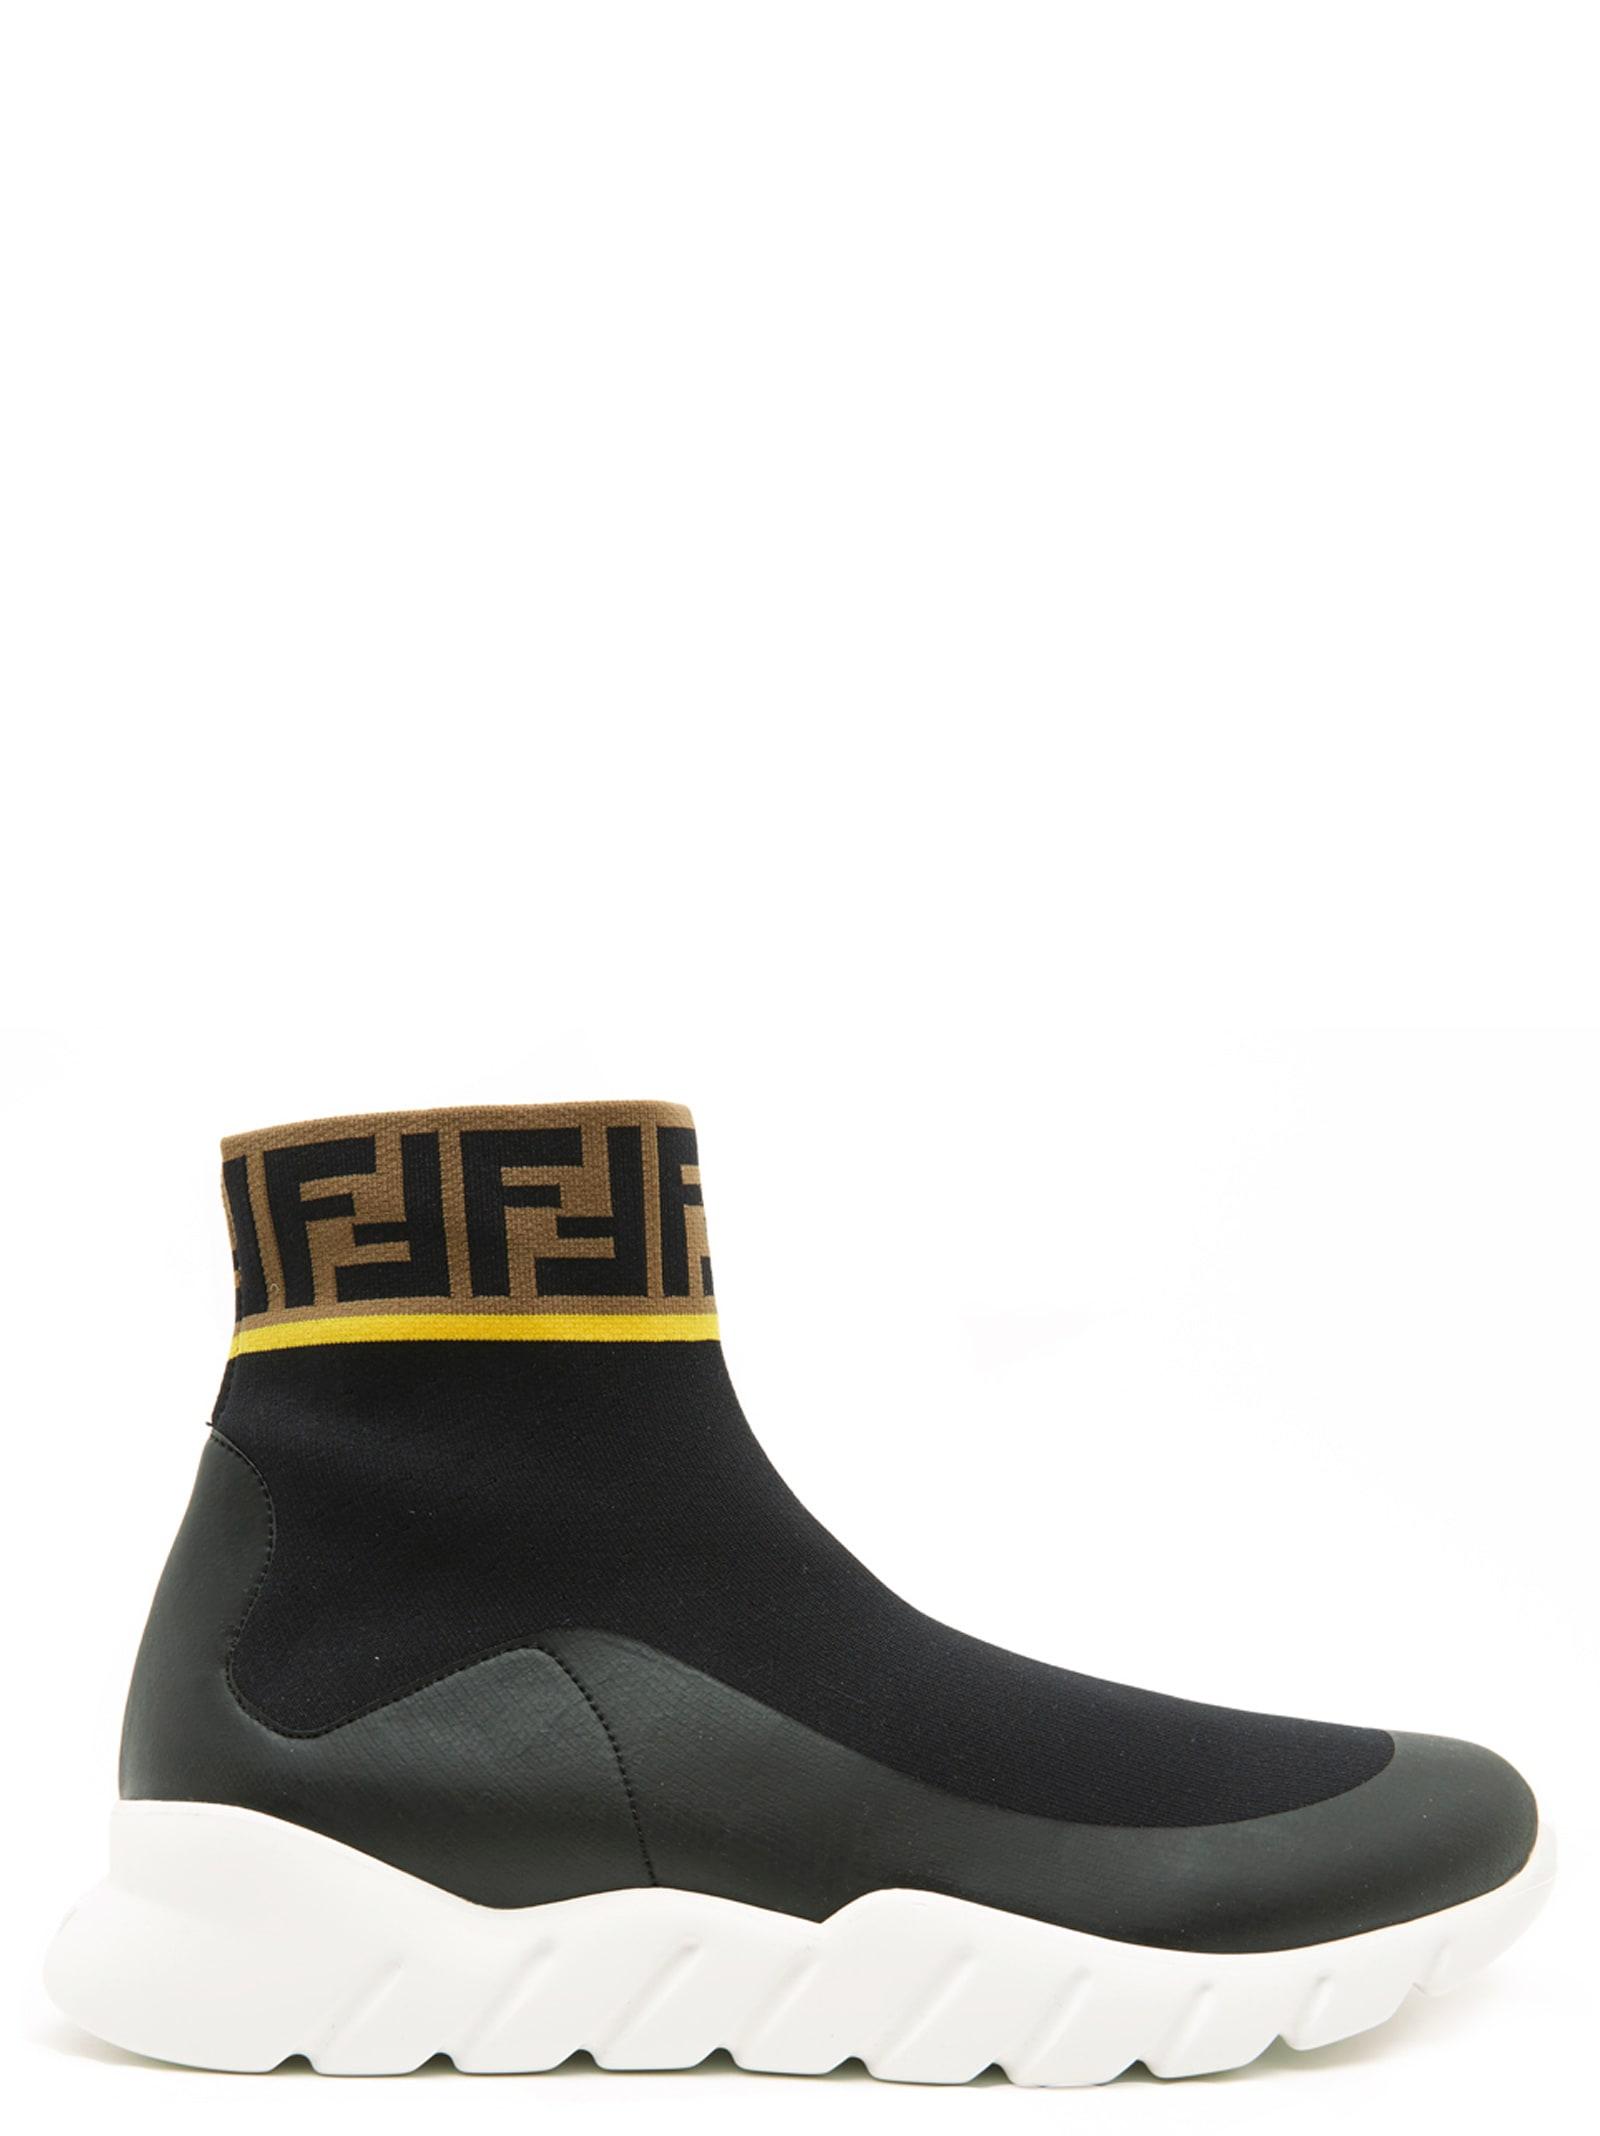 5fced83d8e Fendi Shoes